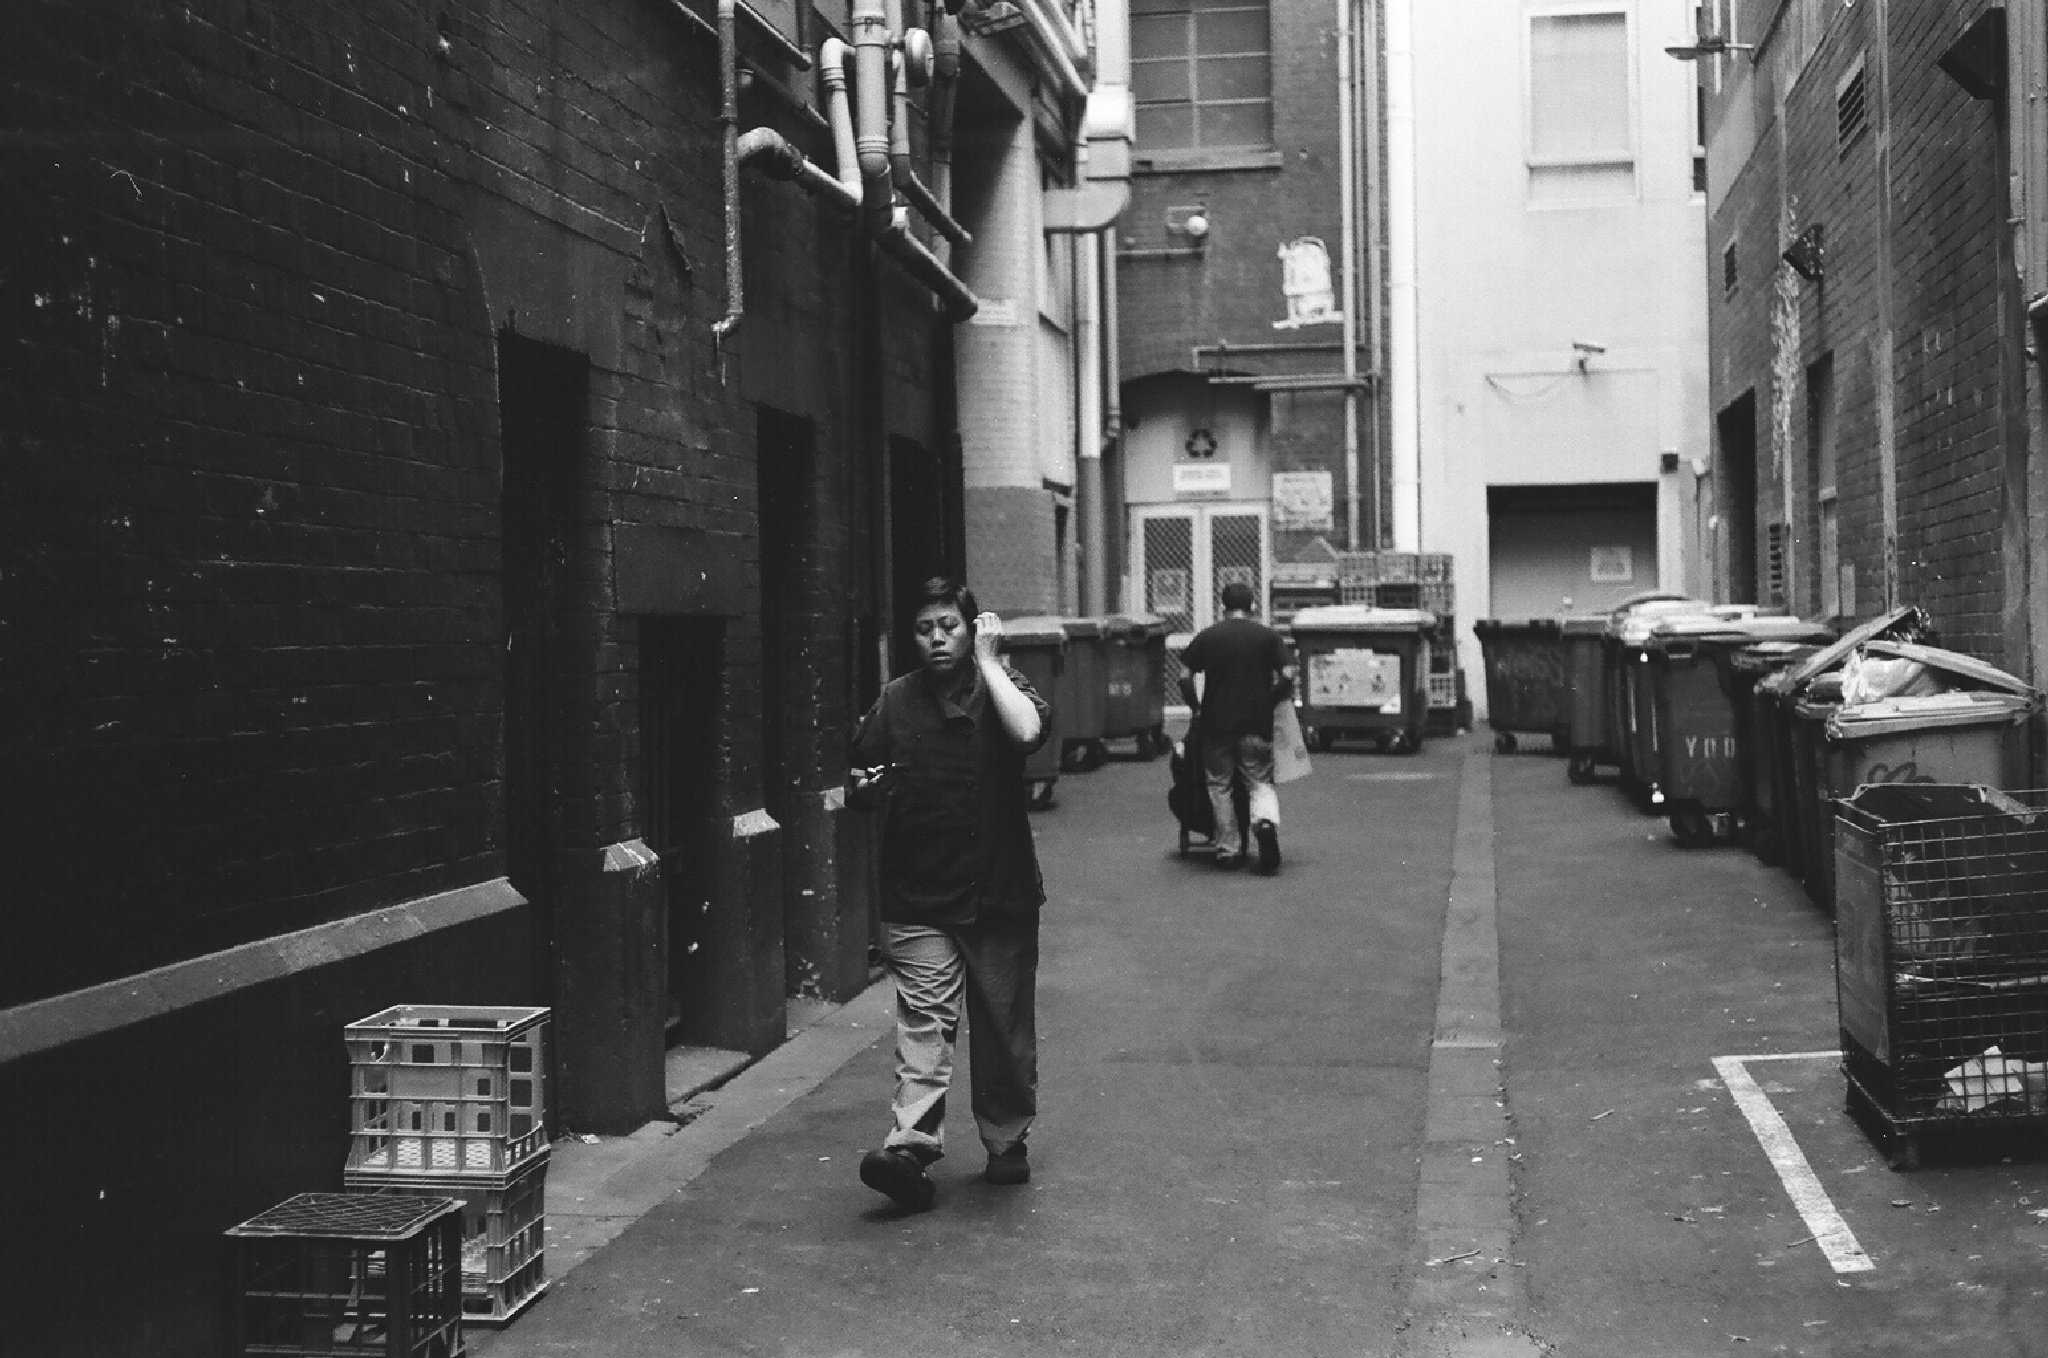 Melbourne, 2014 by Kim Dumayne